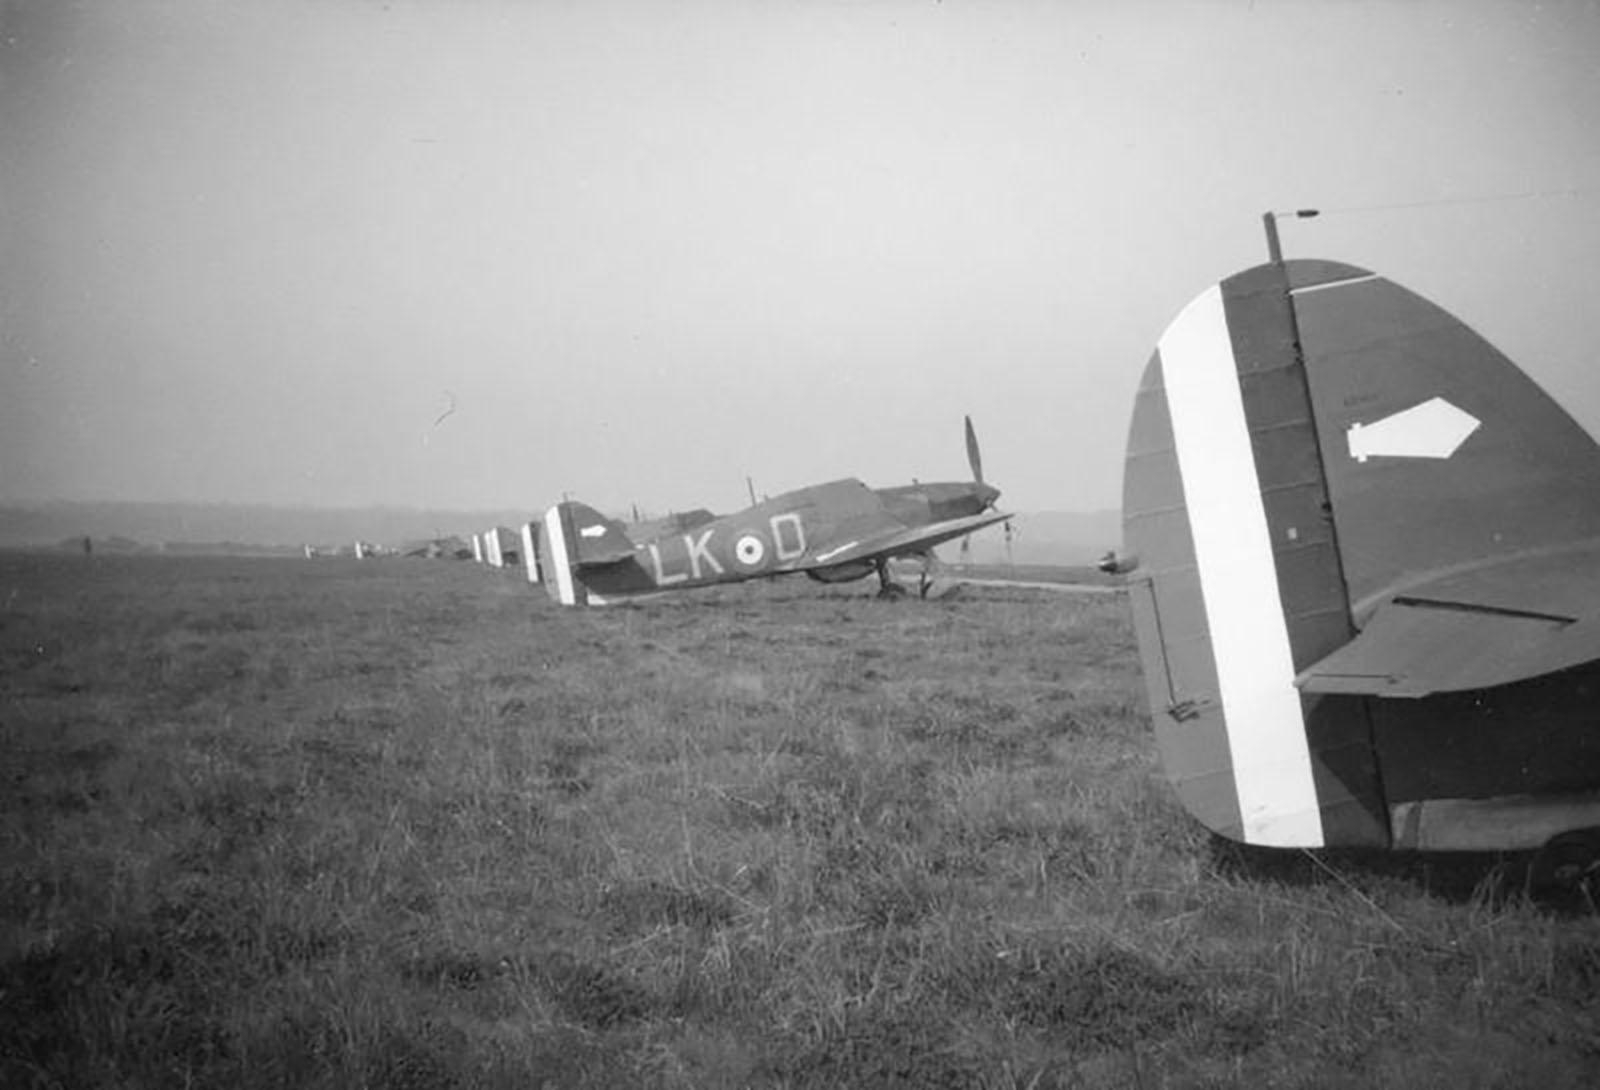 Hawker Hurricane I RAF 87Sqn LKD line up France 1939 01